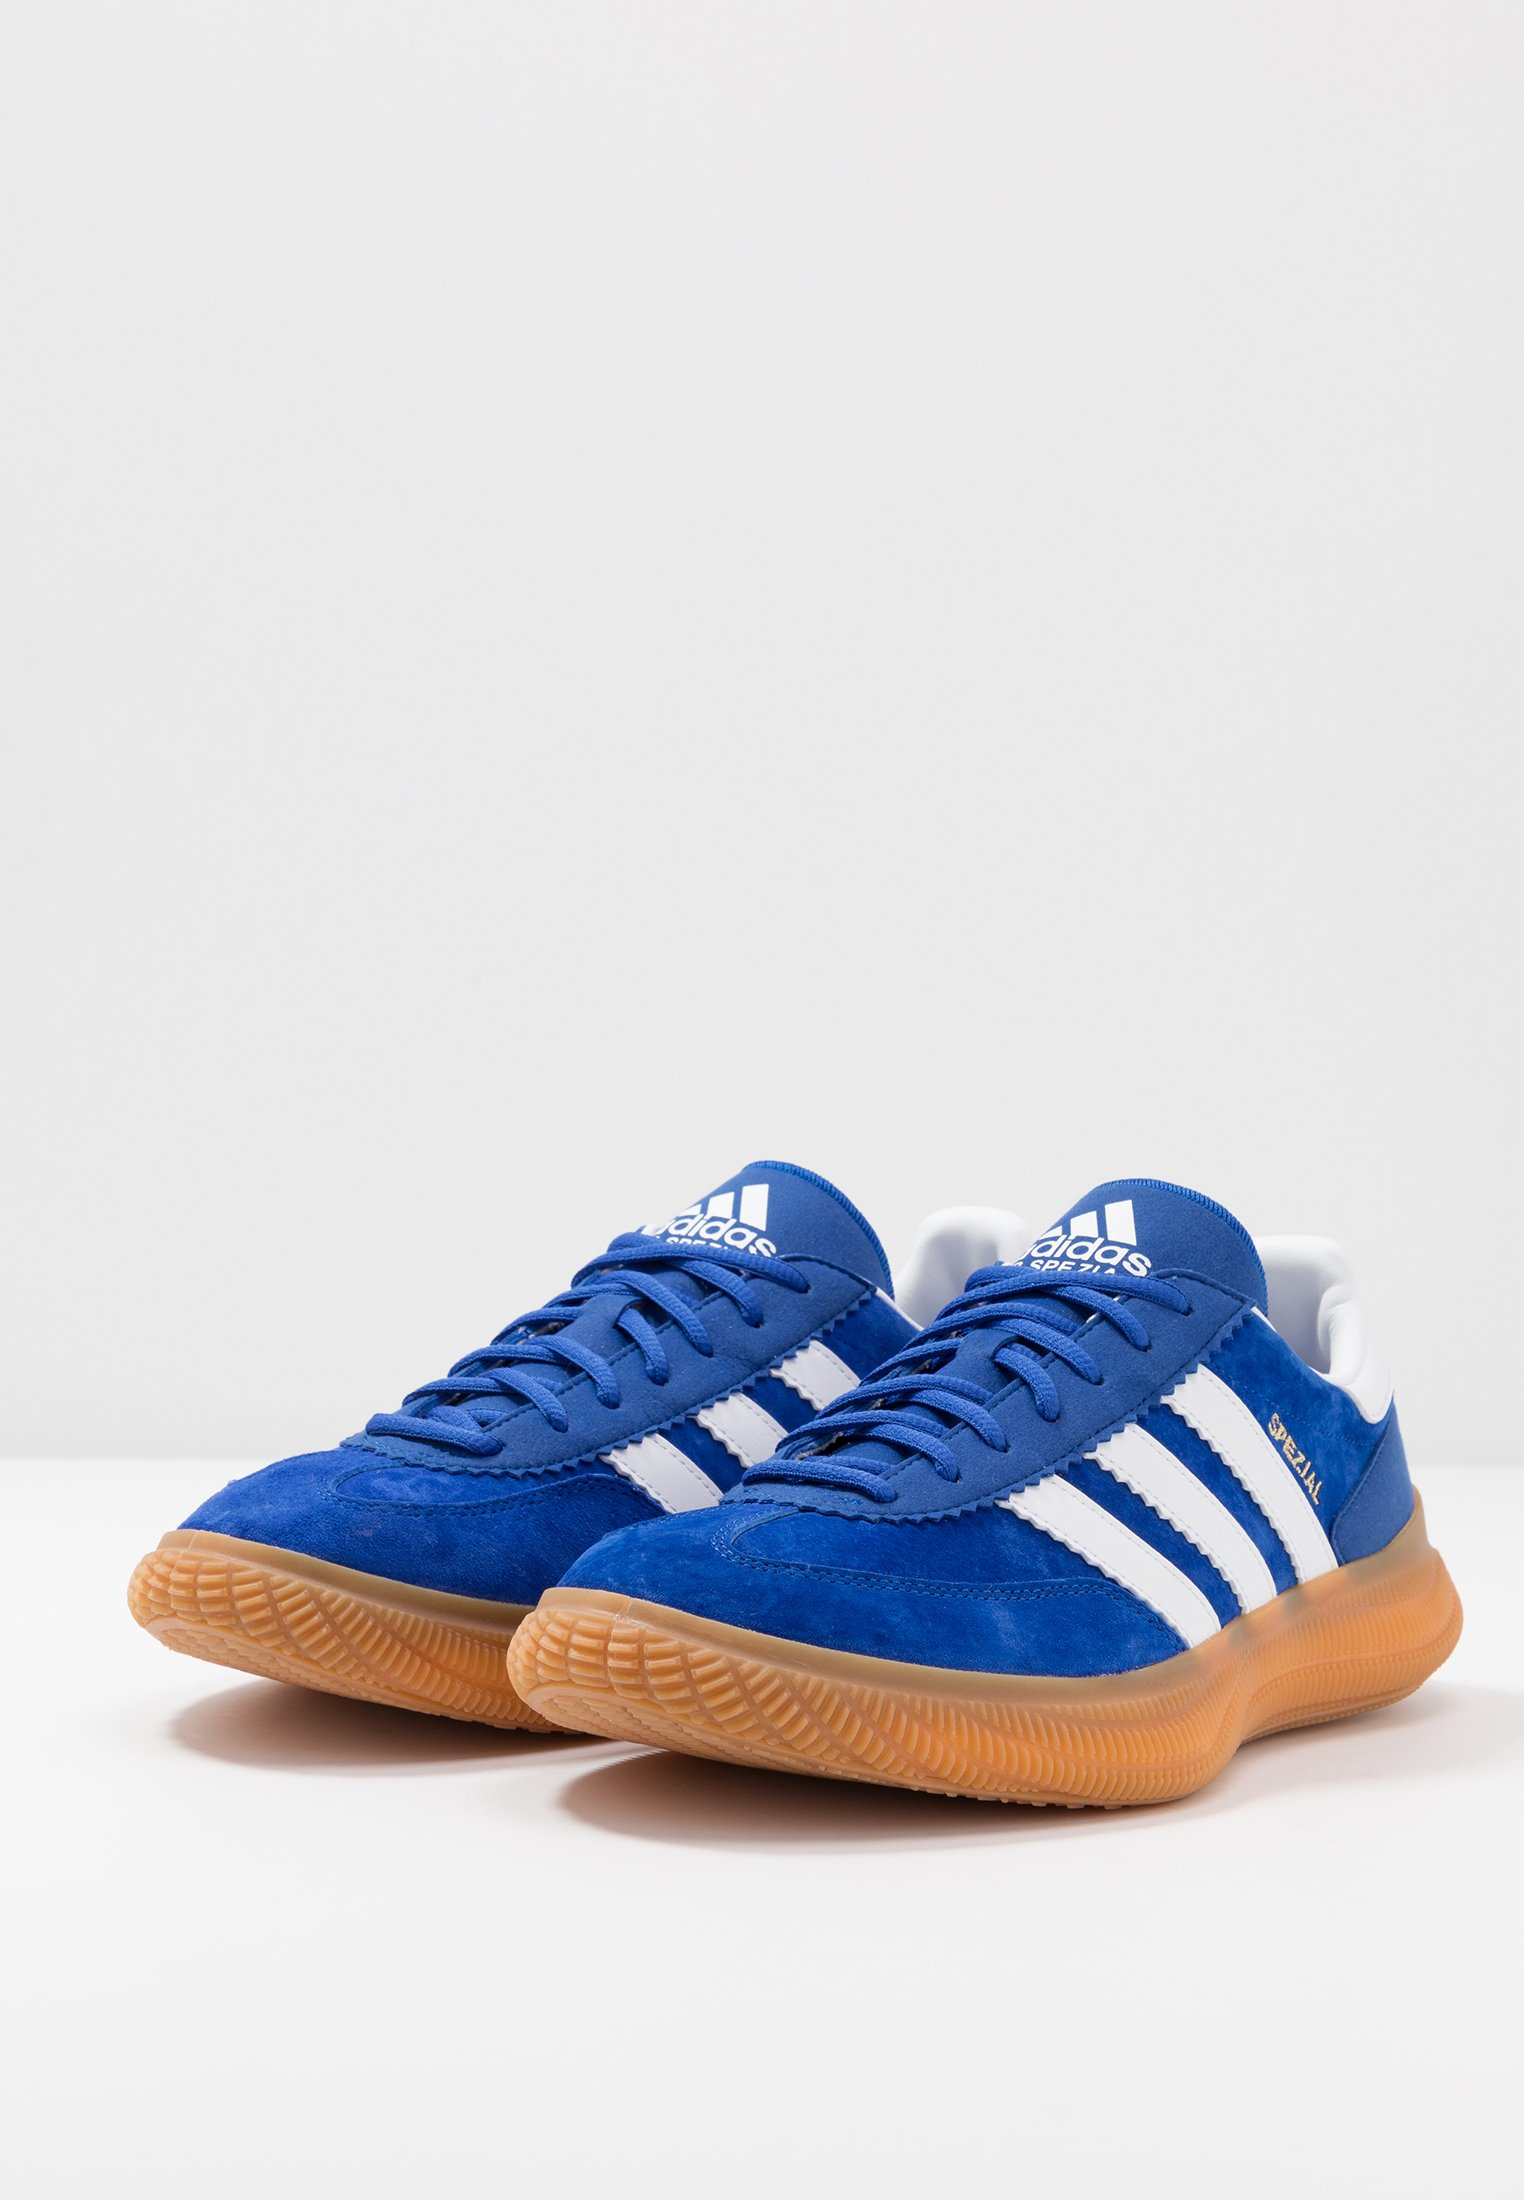 Adidas Pallamano Royal footwear Spezial Da White Metallic Performance gold BoostScarpe uFJc5l13TK